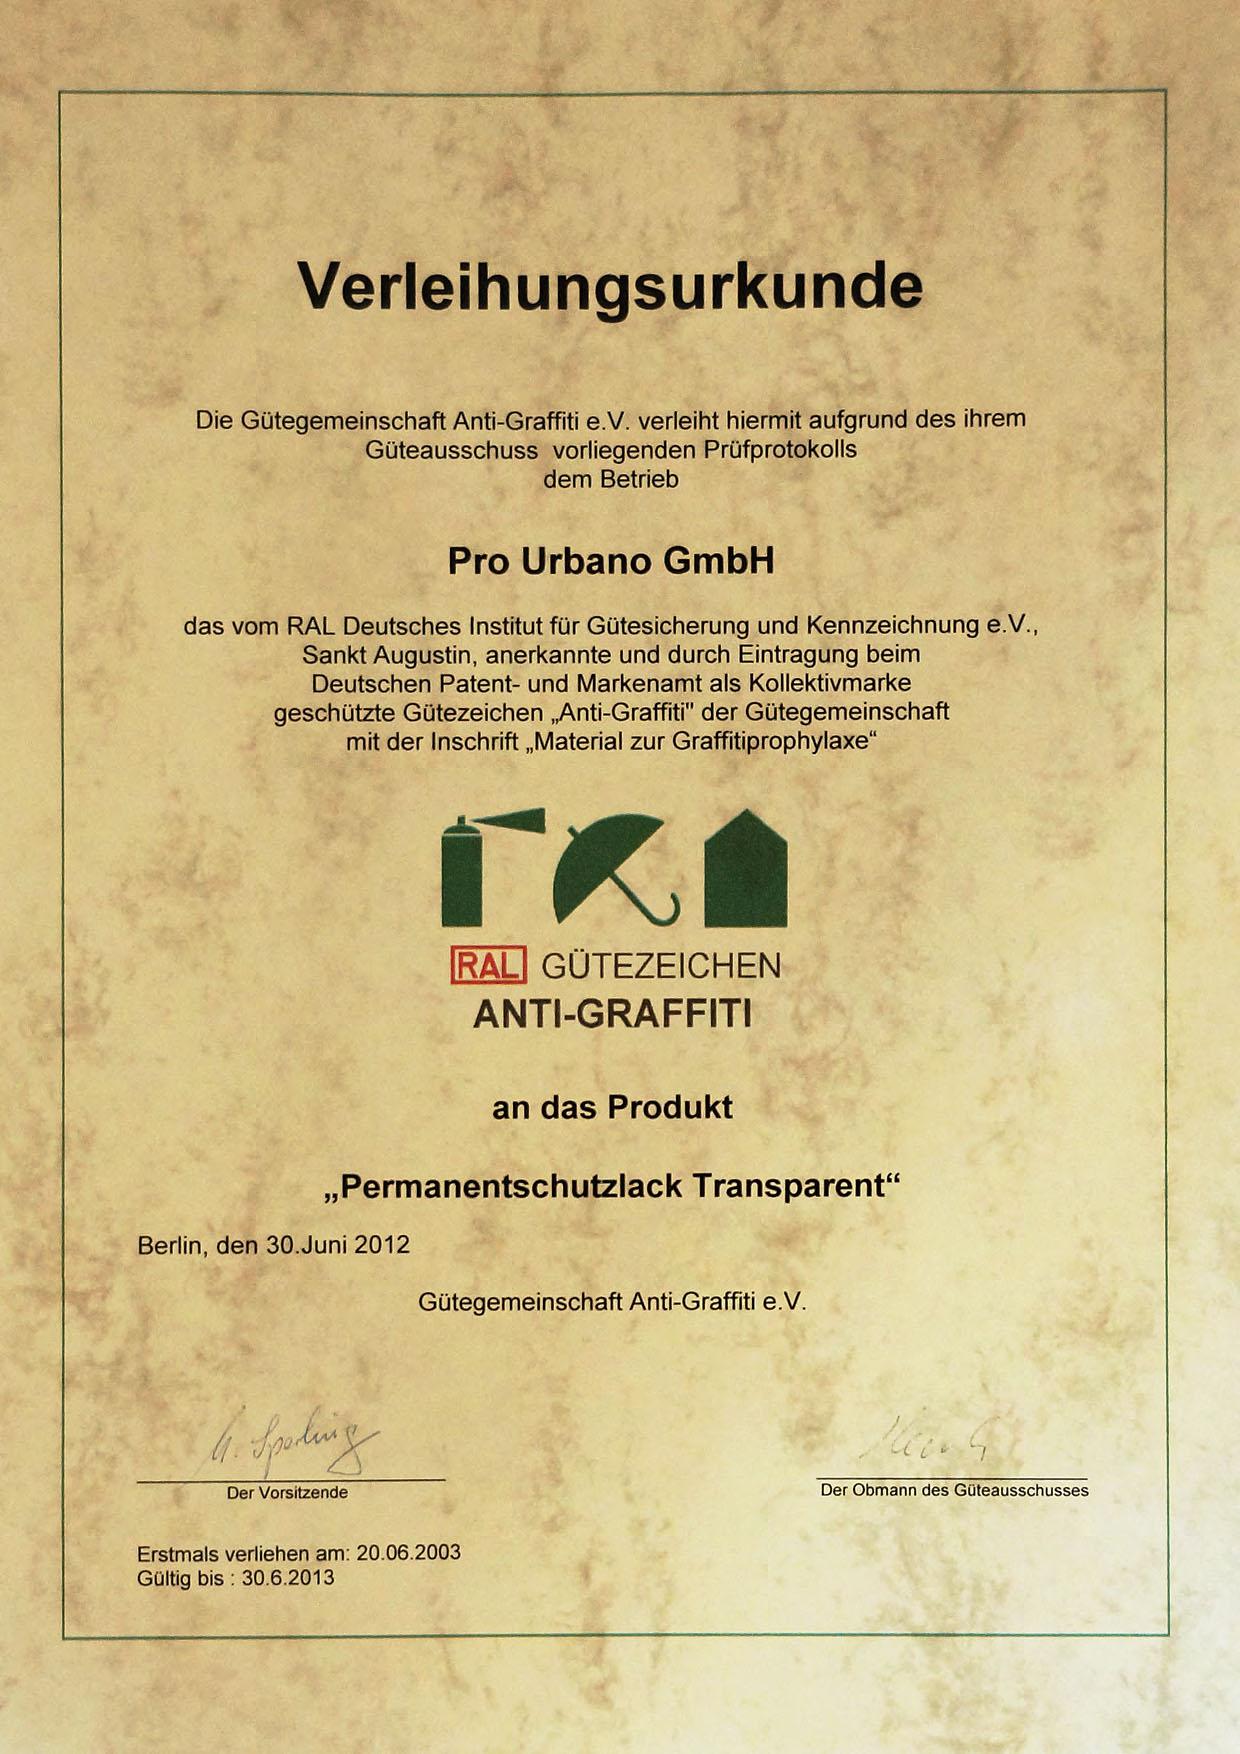 Urkunde_Perma_Transparent_2012